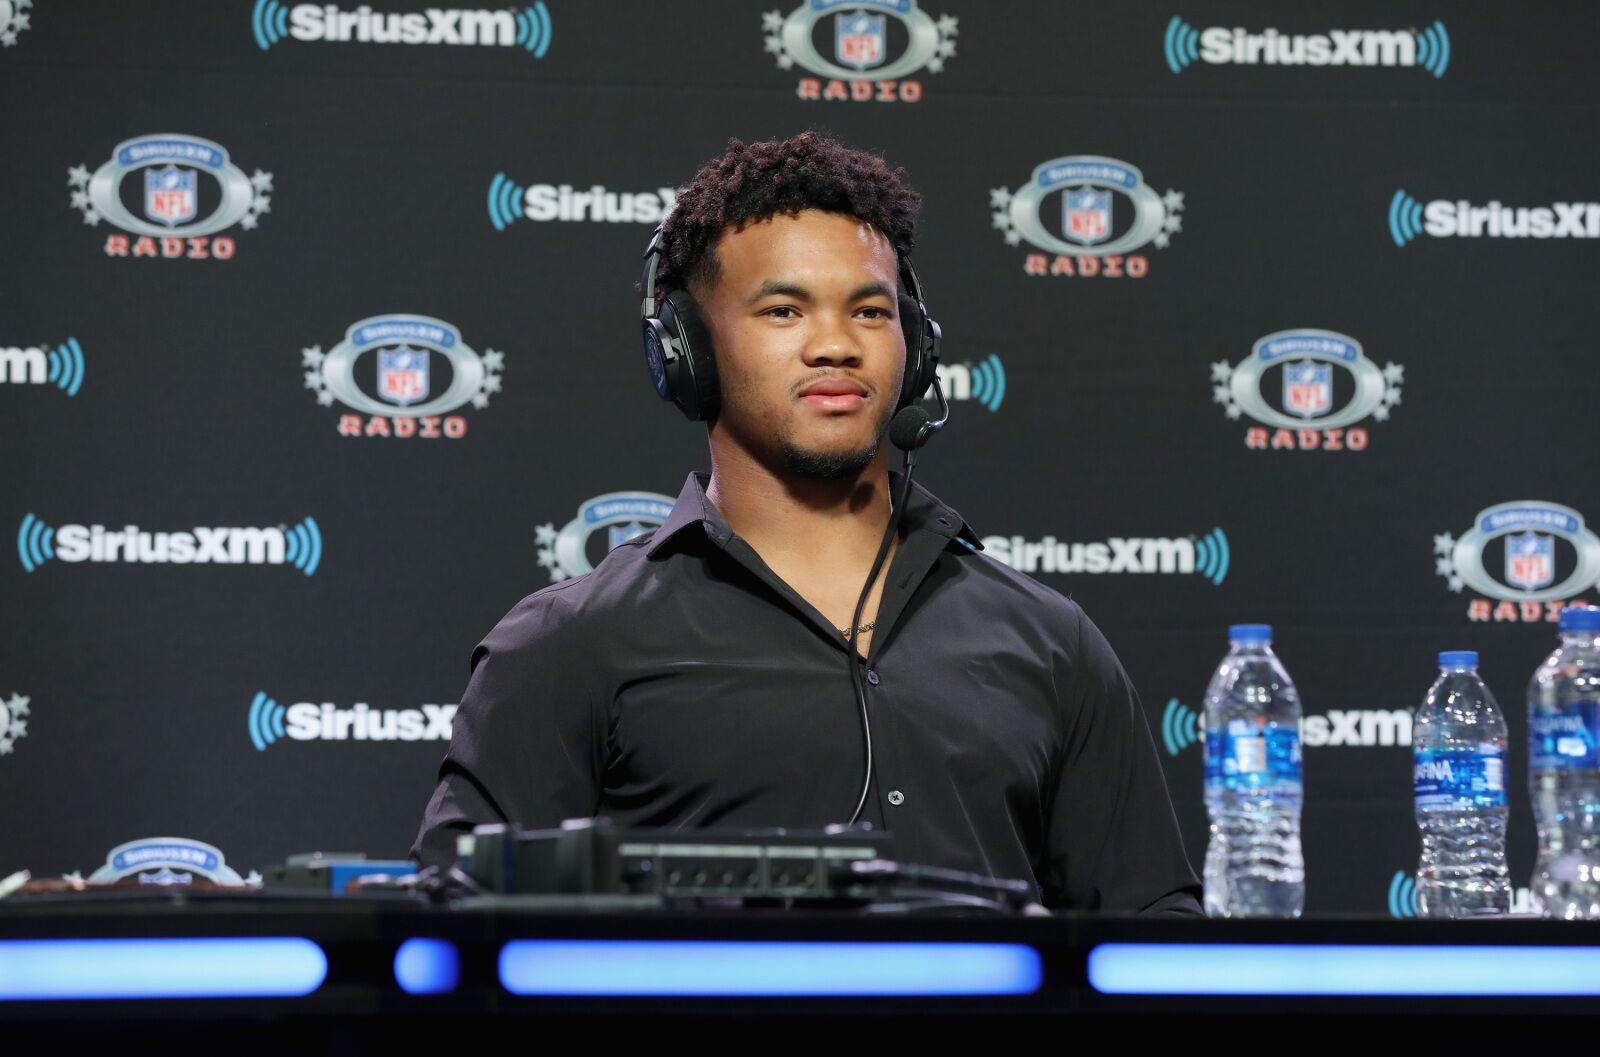 2019 NFL Draft: 5 better QB options over Kyler Murray